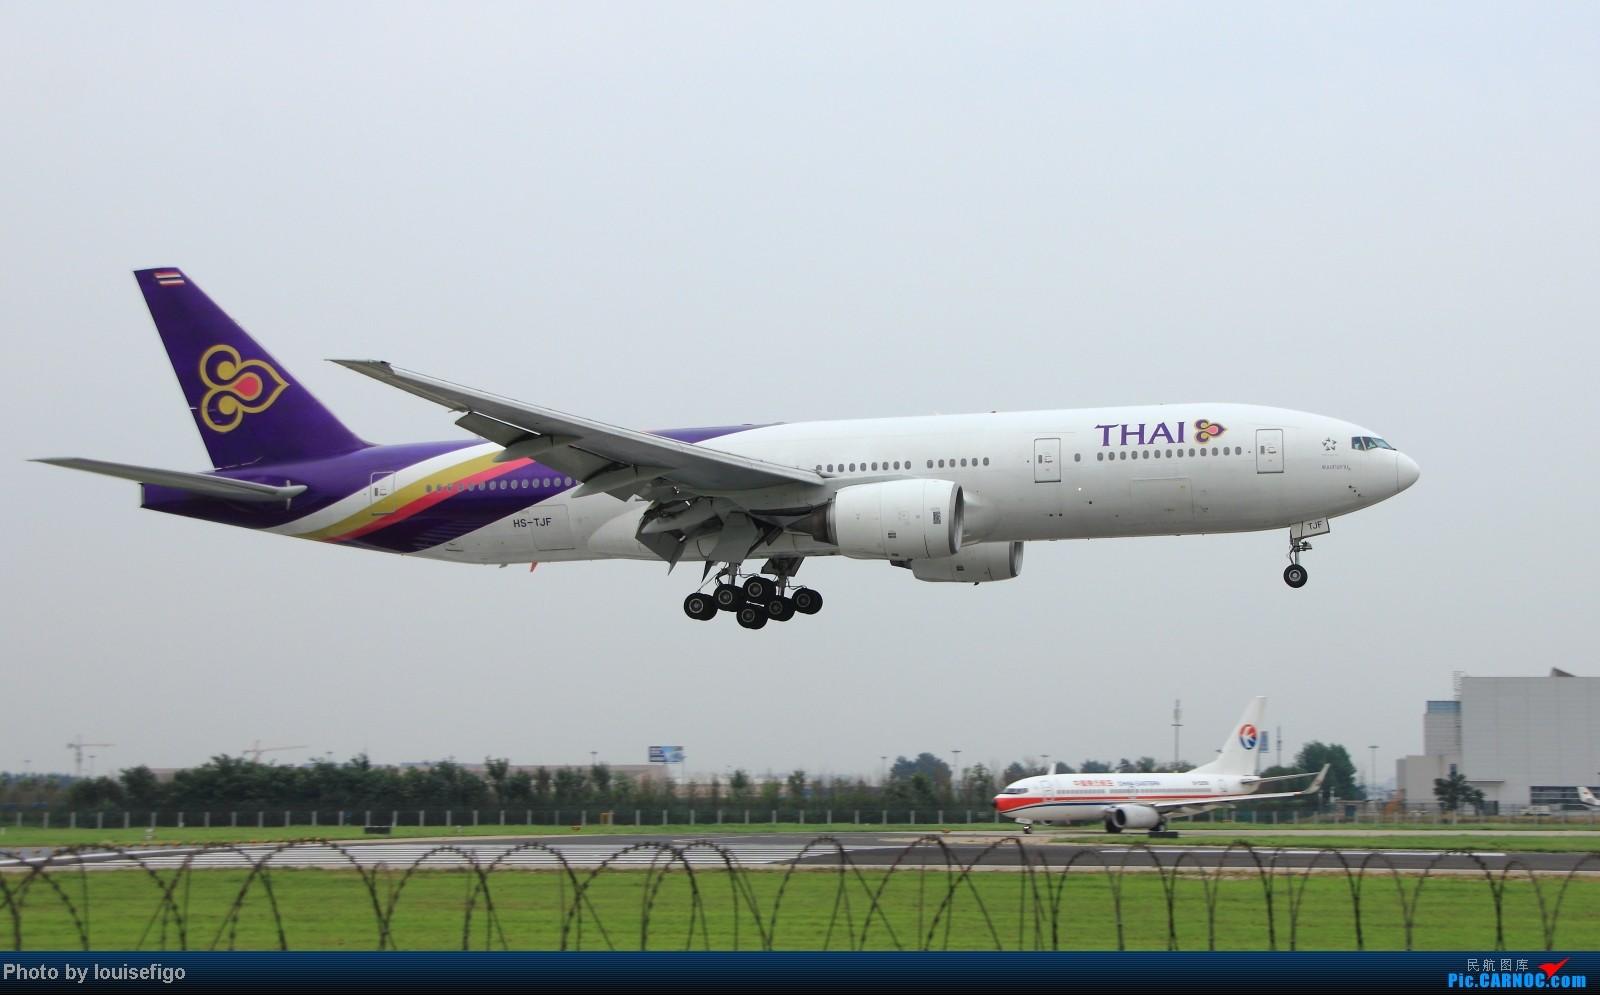 Re:[原创]闲来无事天气闷,发点冷饭自娱乐!!!PEK西跑的降落杂图~发到哪儿是哪儿啊!随心情! BOEING 777-200 HS-TJF 北京首都国际机场